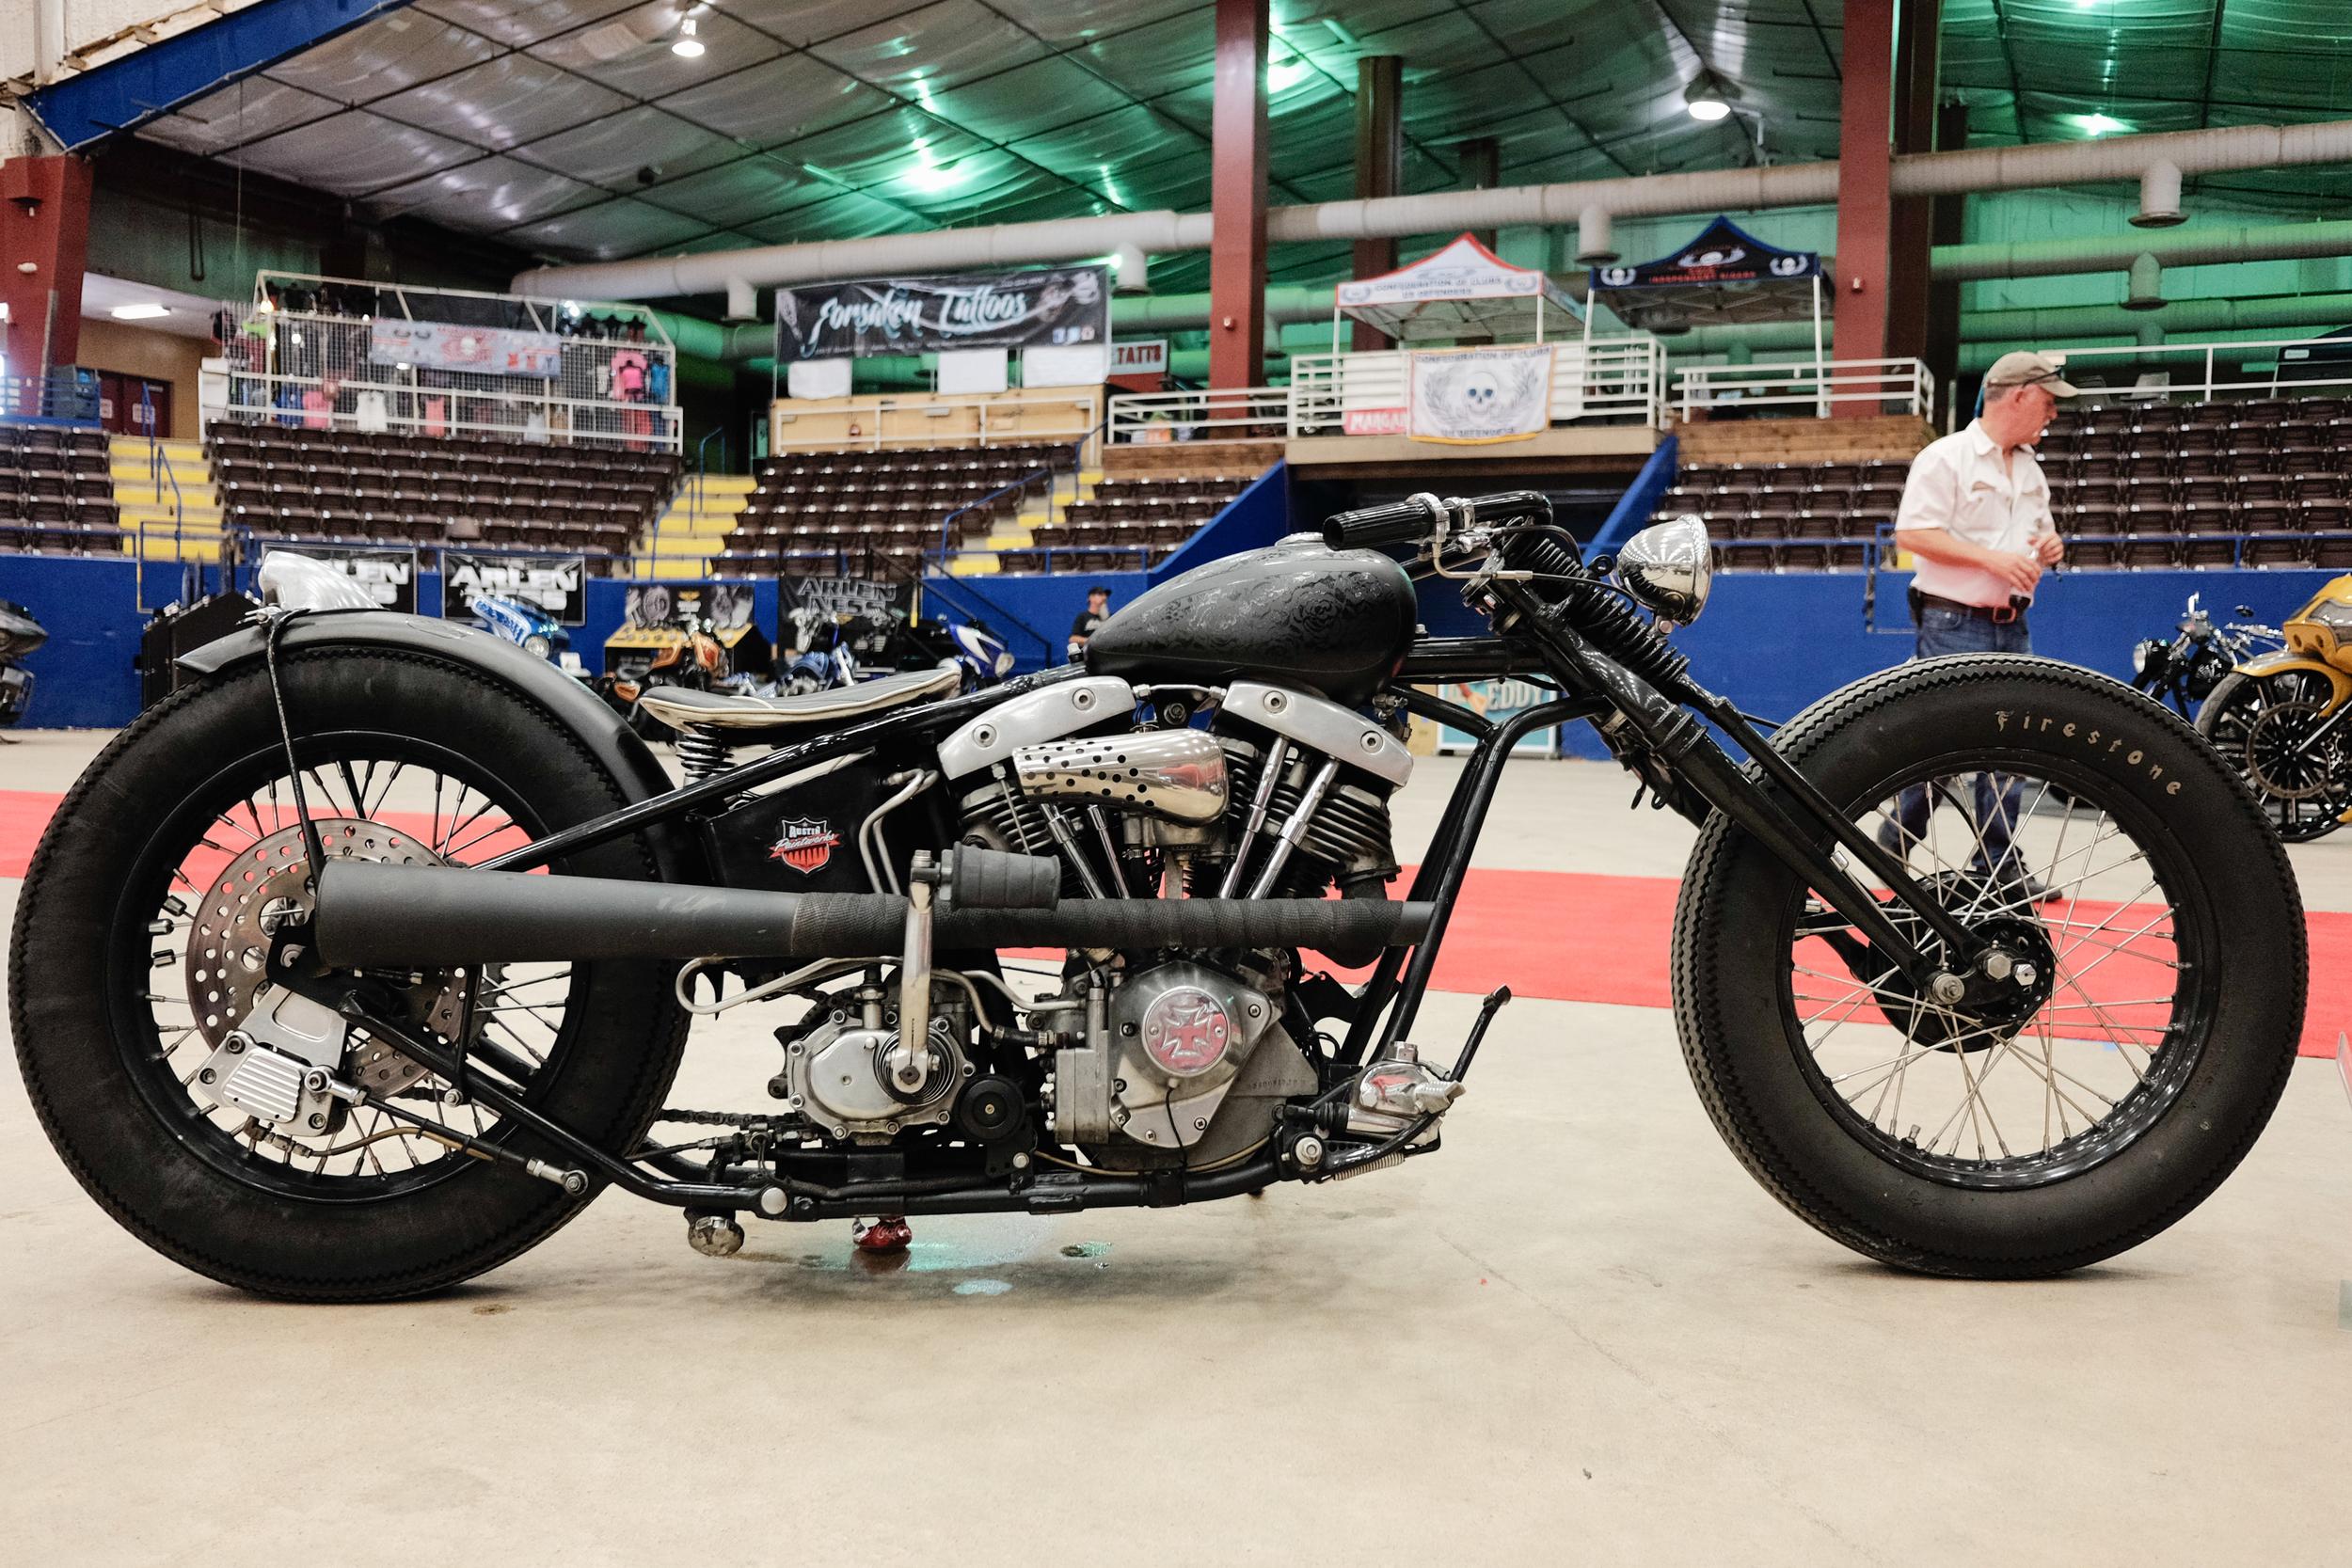 rot-rally-custom-bike-show-2016-0022.jpg